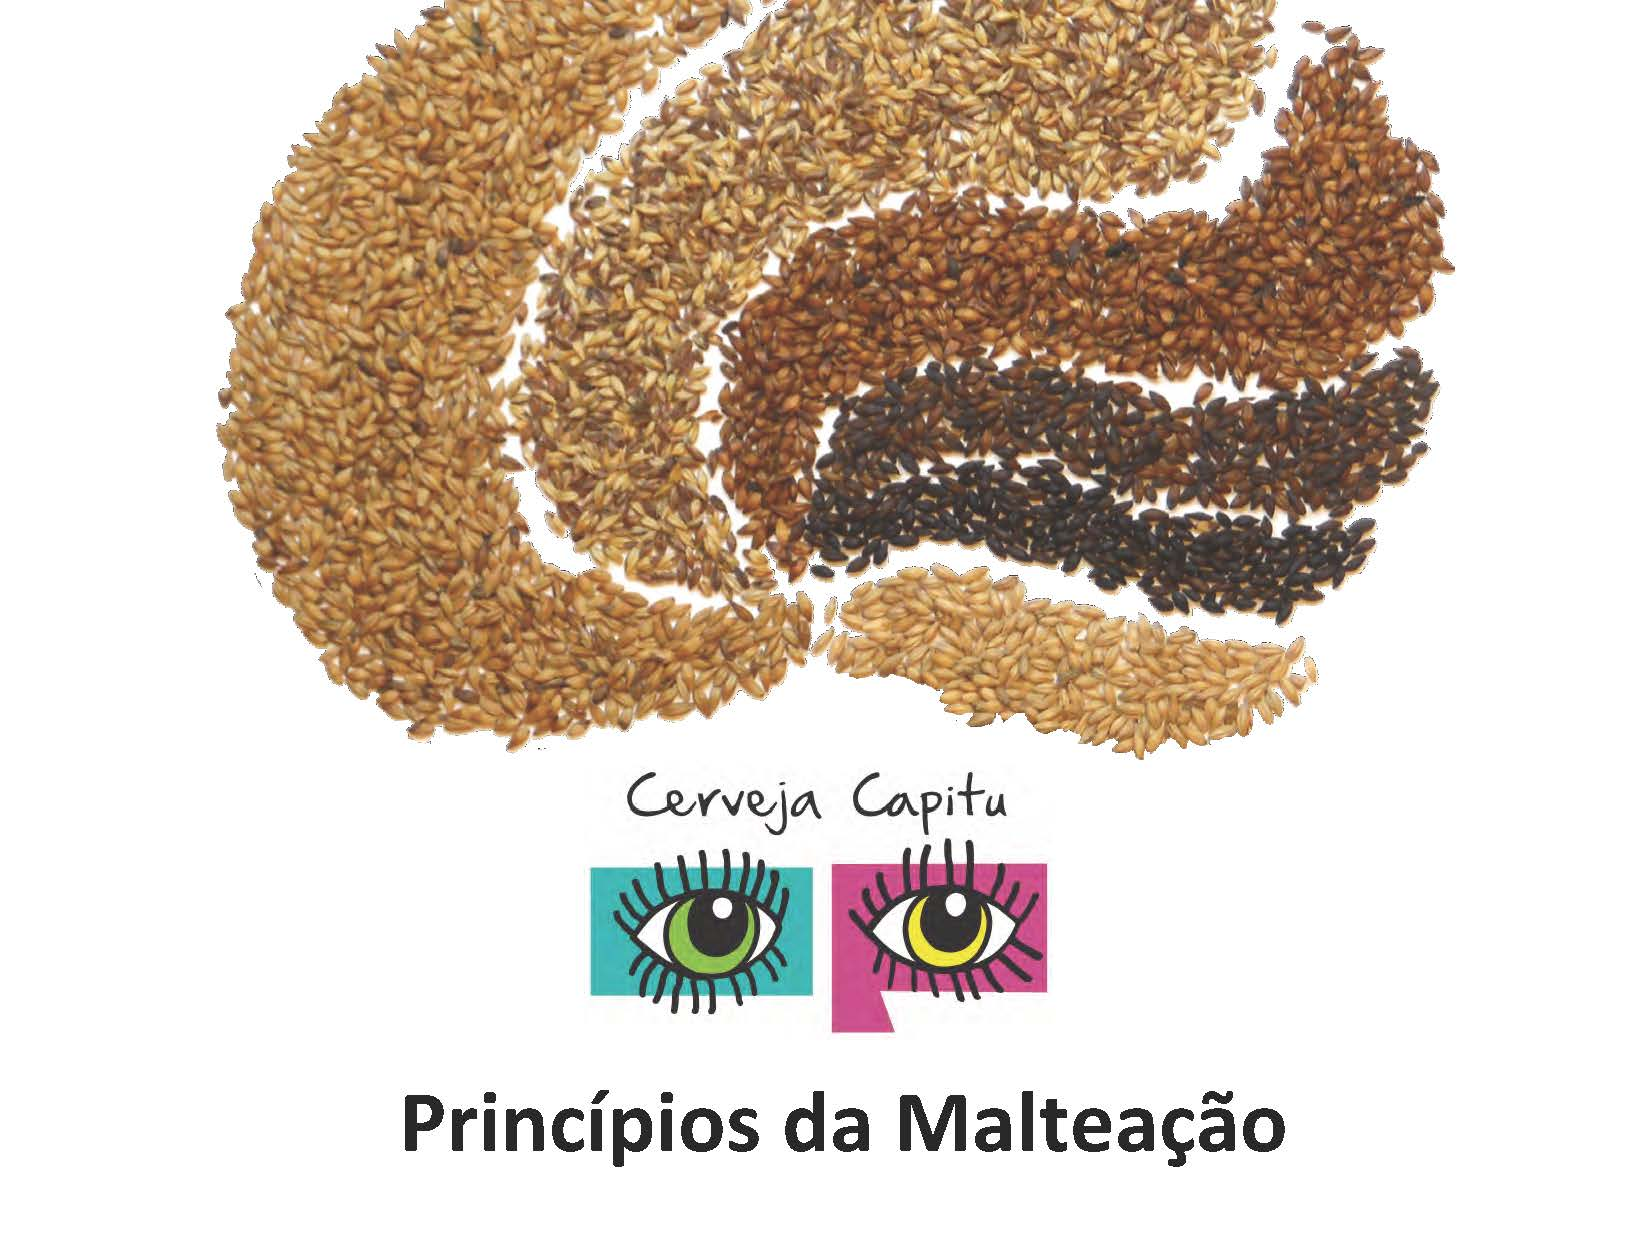 Princípios da Malteação_Capitu_SM_Page_01.jpg